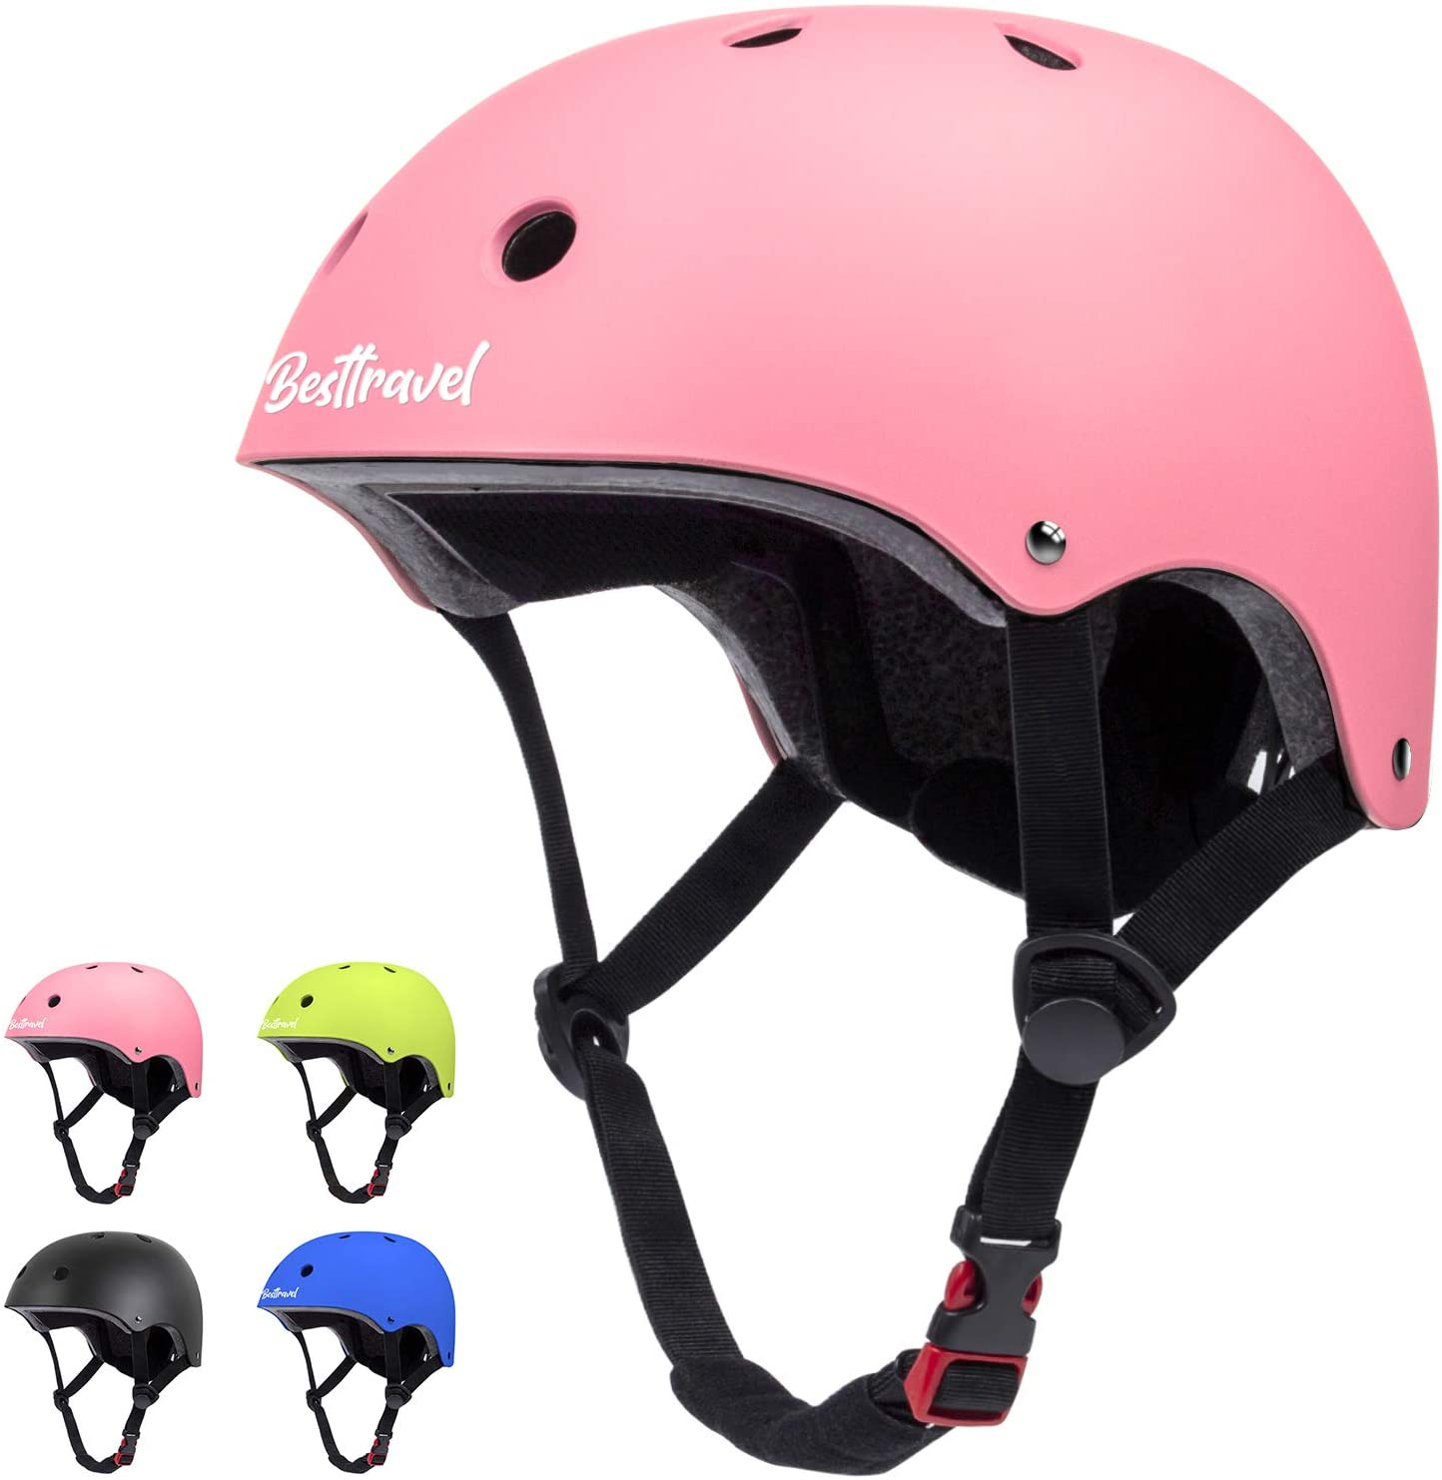 BestTravel Kids Helmet